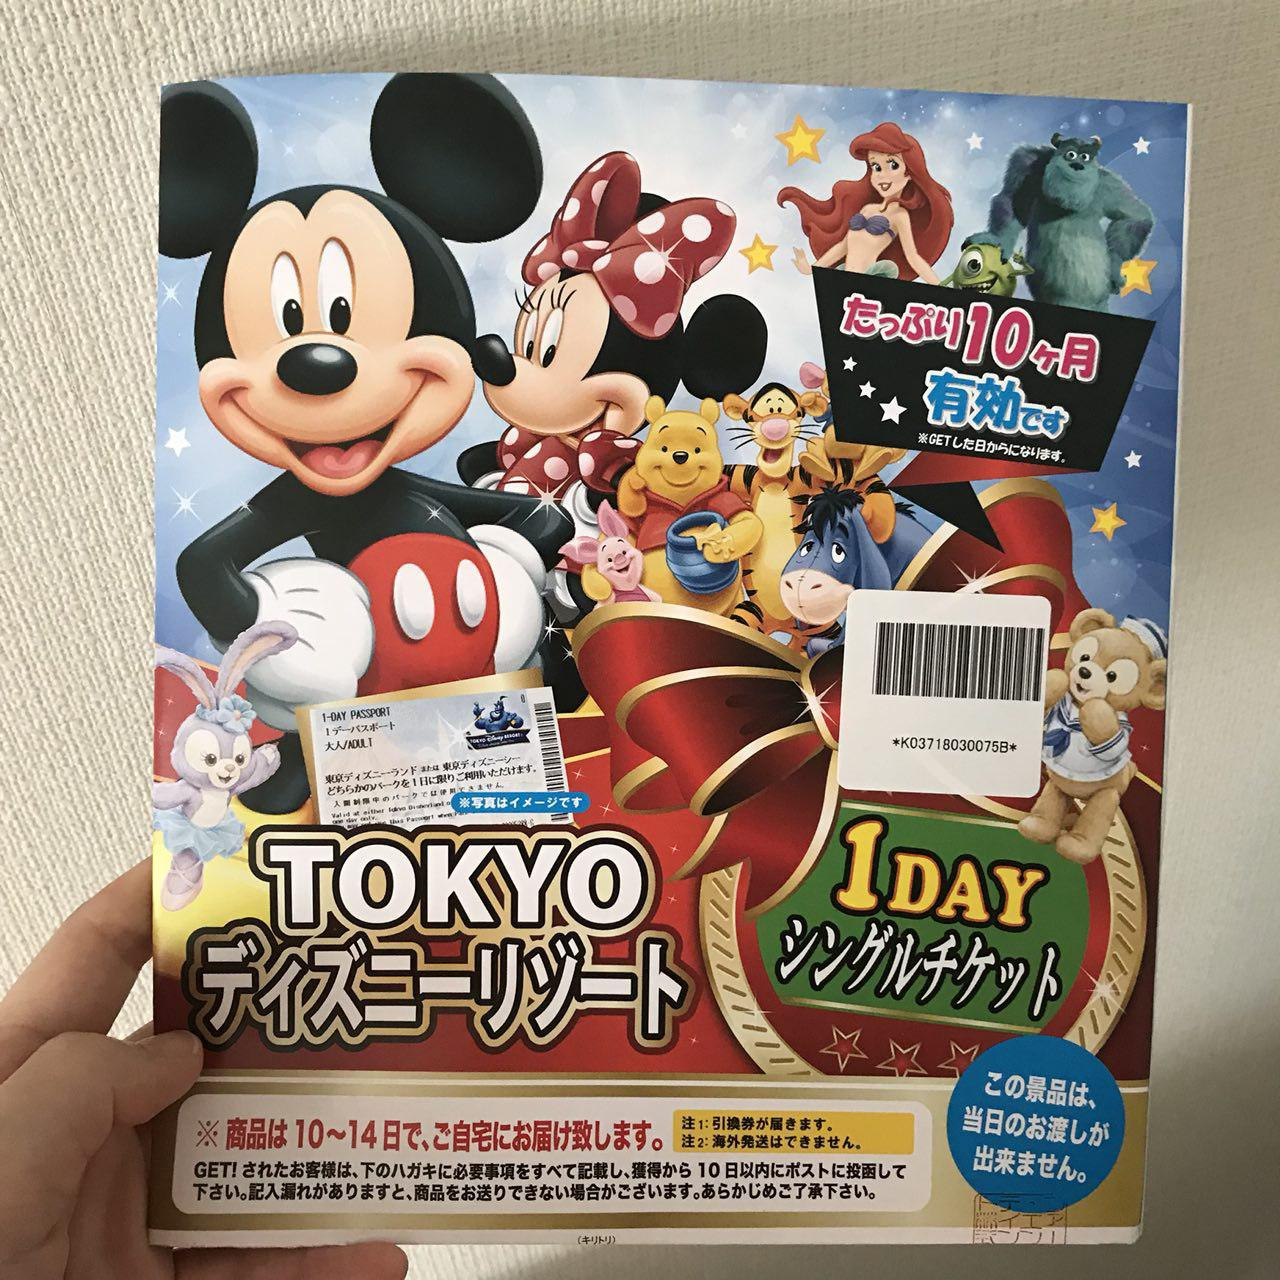 photo_2018-07-13_18-52-05.jpg